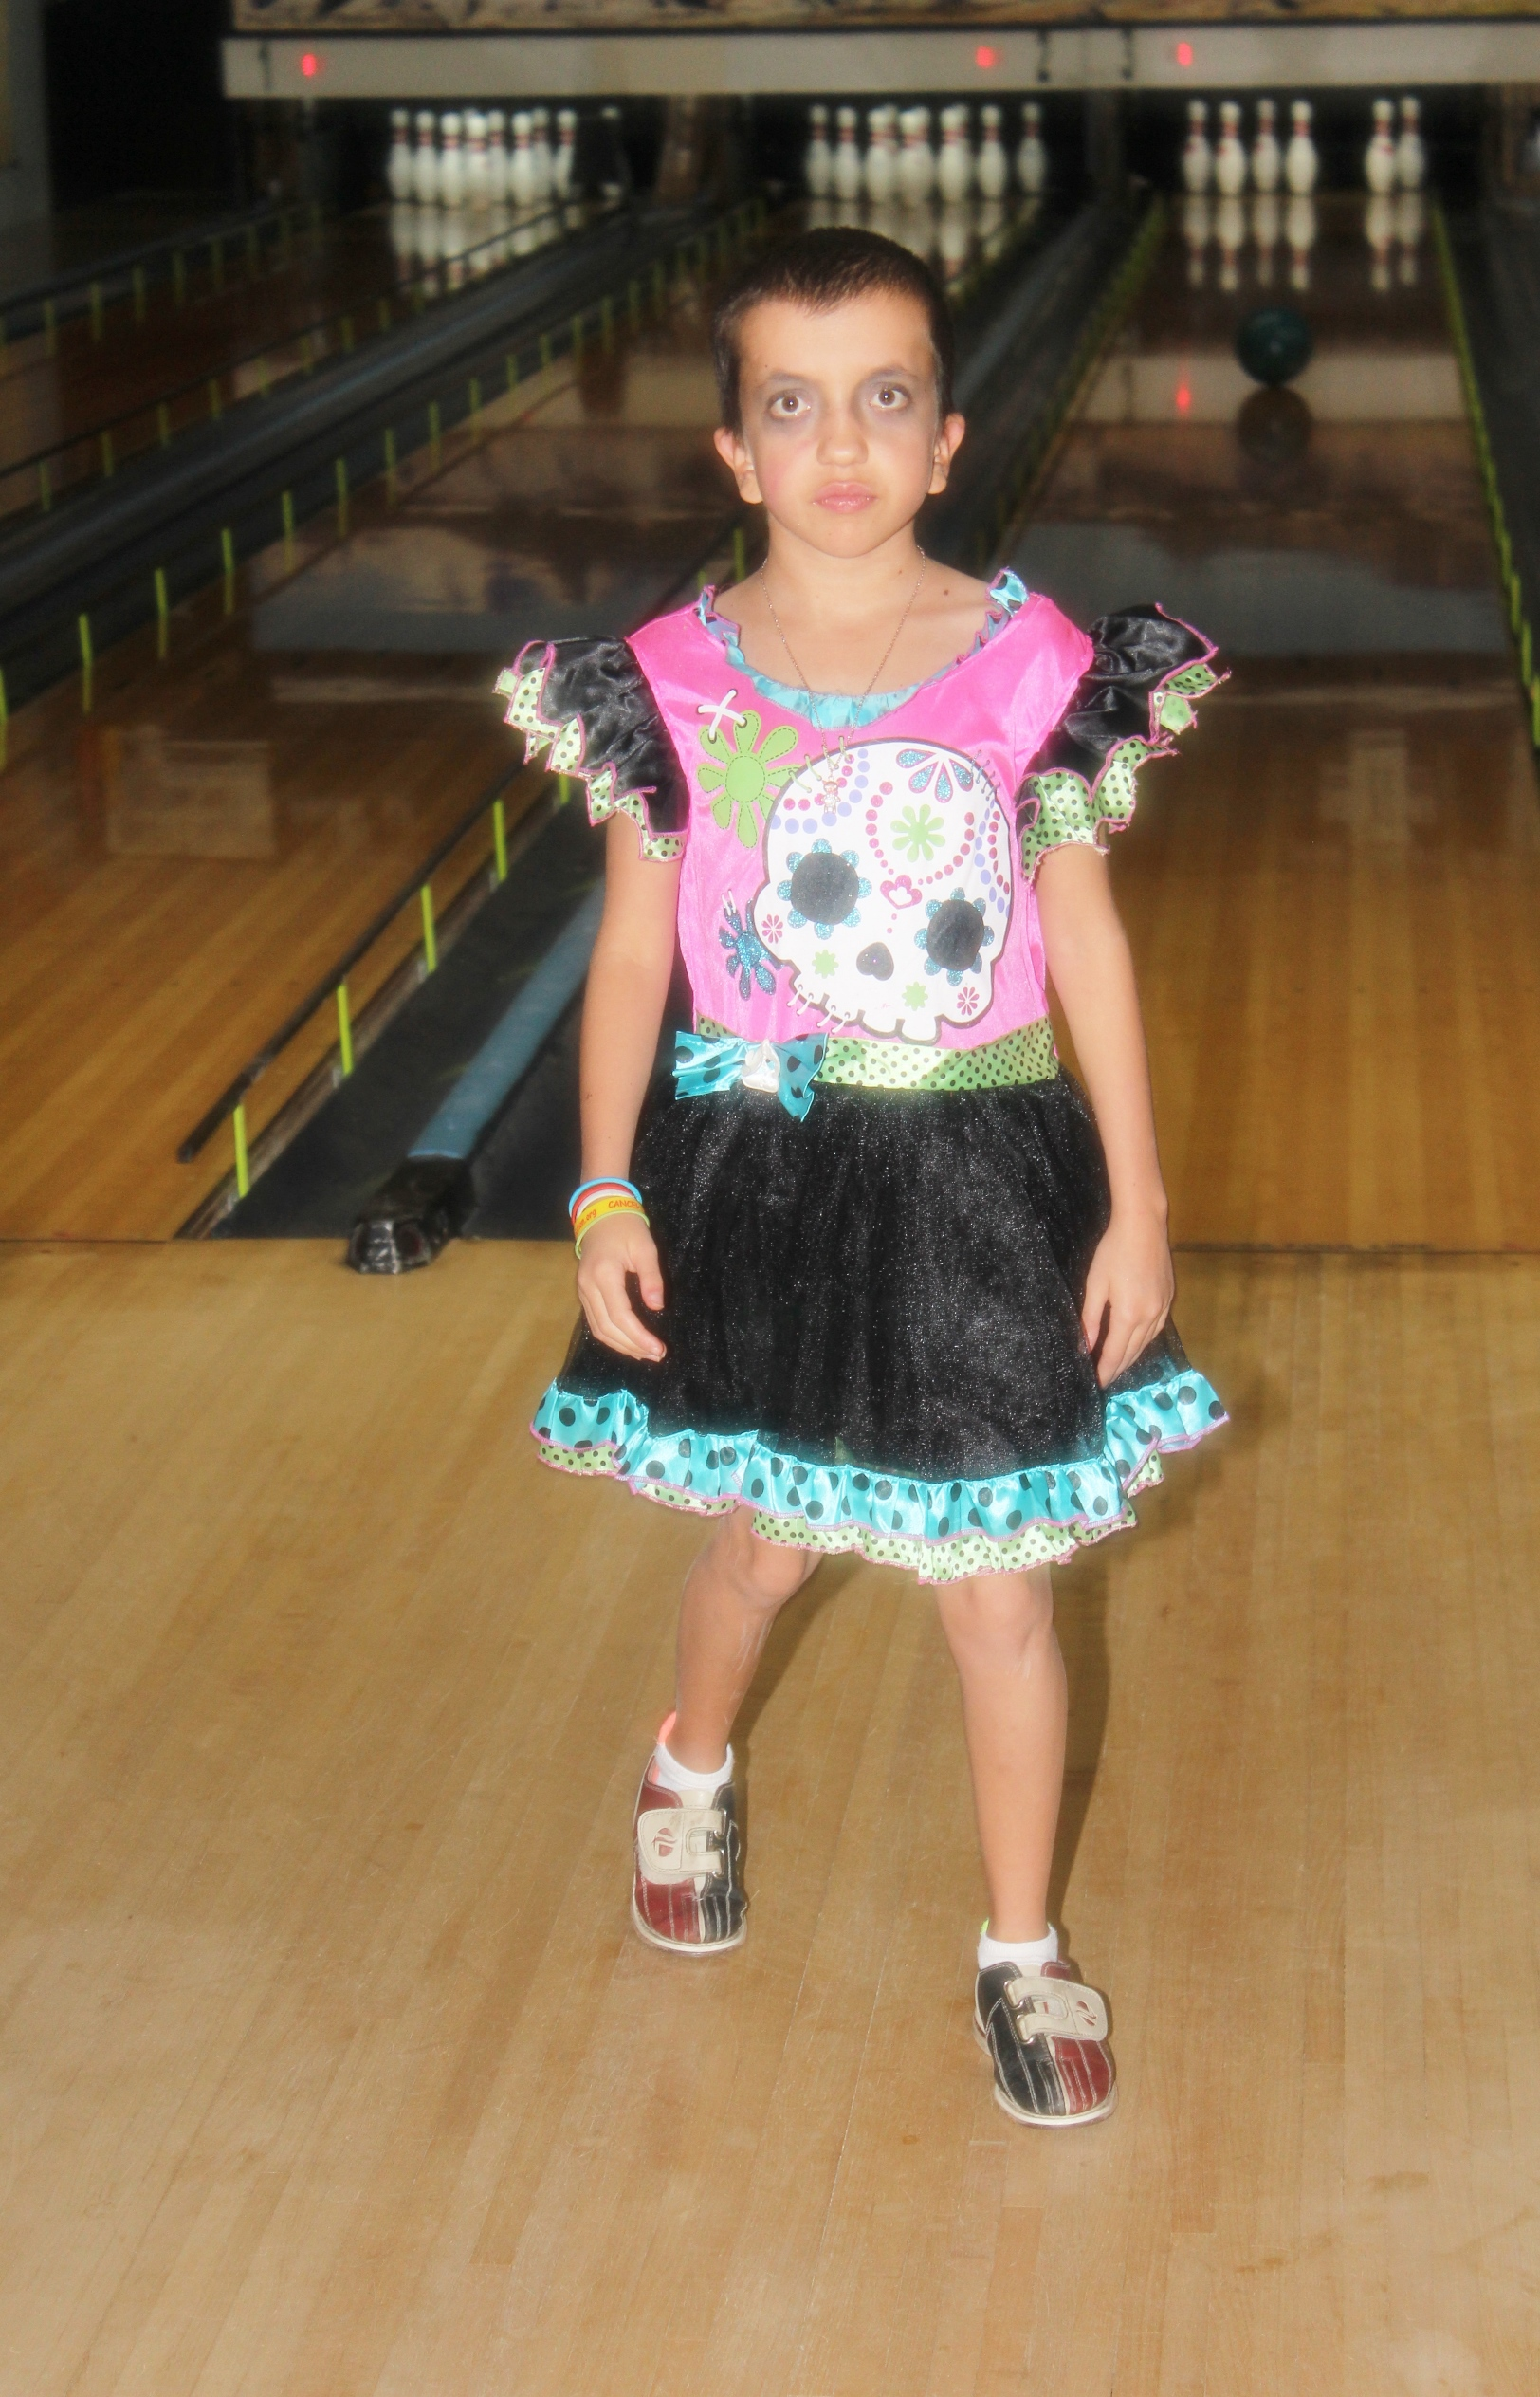 Bowling-2015 - IMG_1874